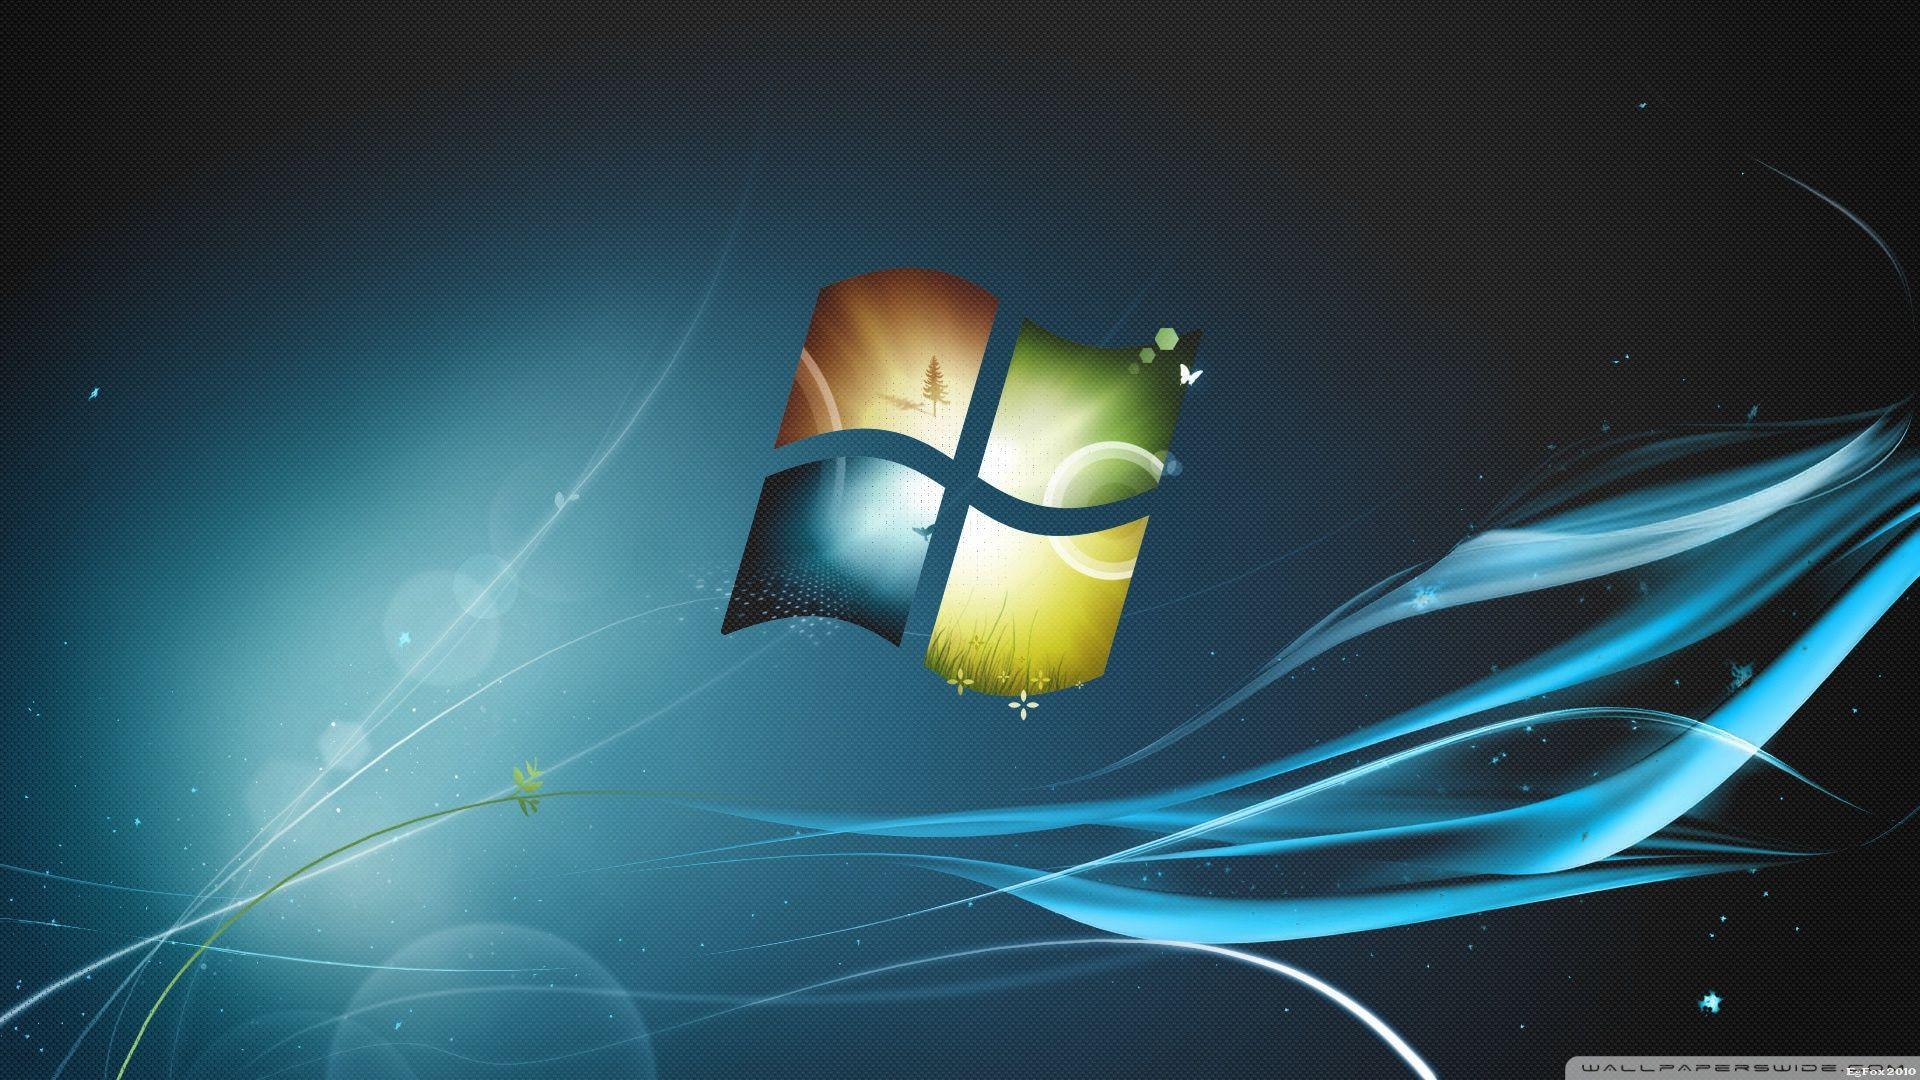 Fondo De Pantalla De Xp En Hd: Cool Windows XP Wallpapers In HD For Free Download